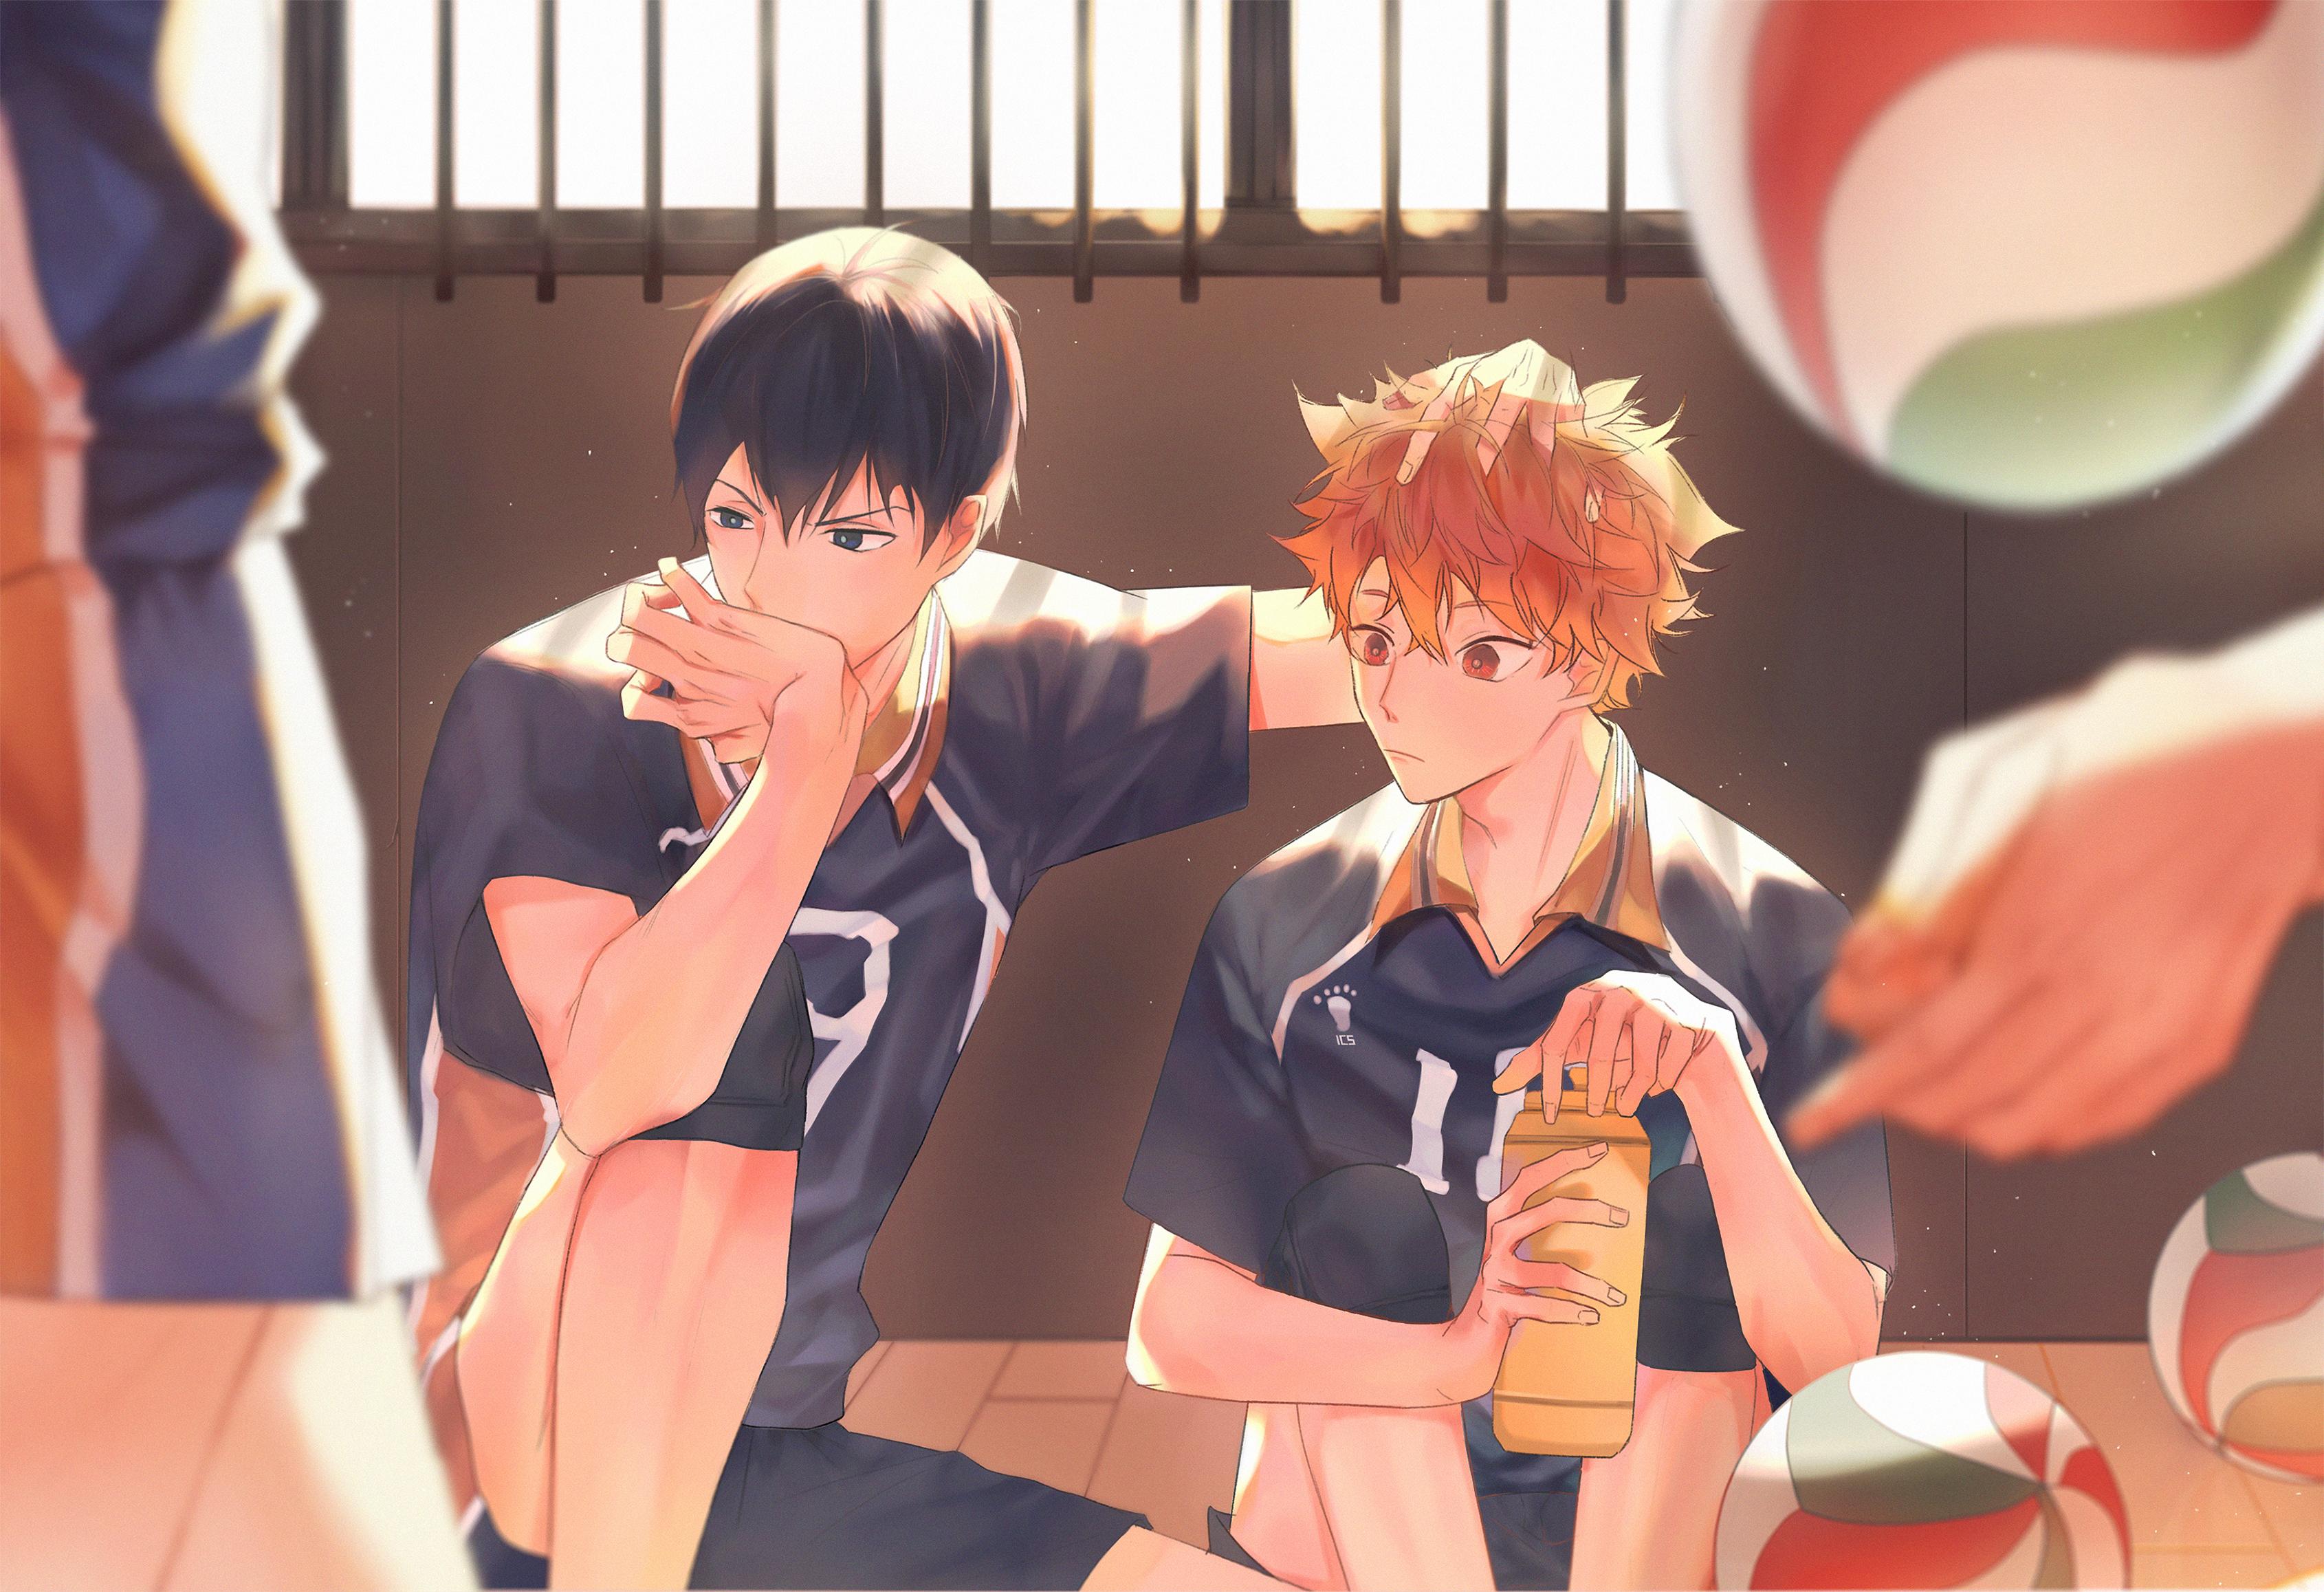 KageHina - Haikyuu!! - Image #2633099 - Zerochan Anime Image